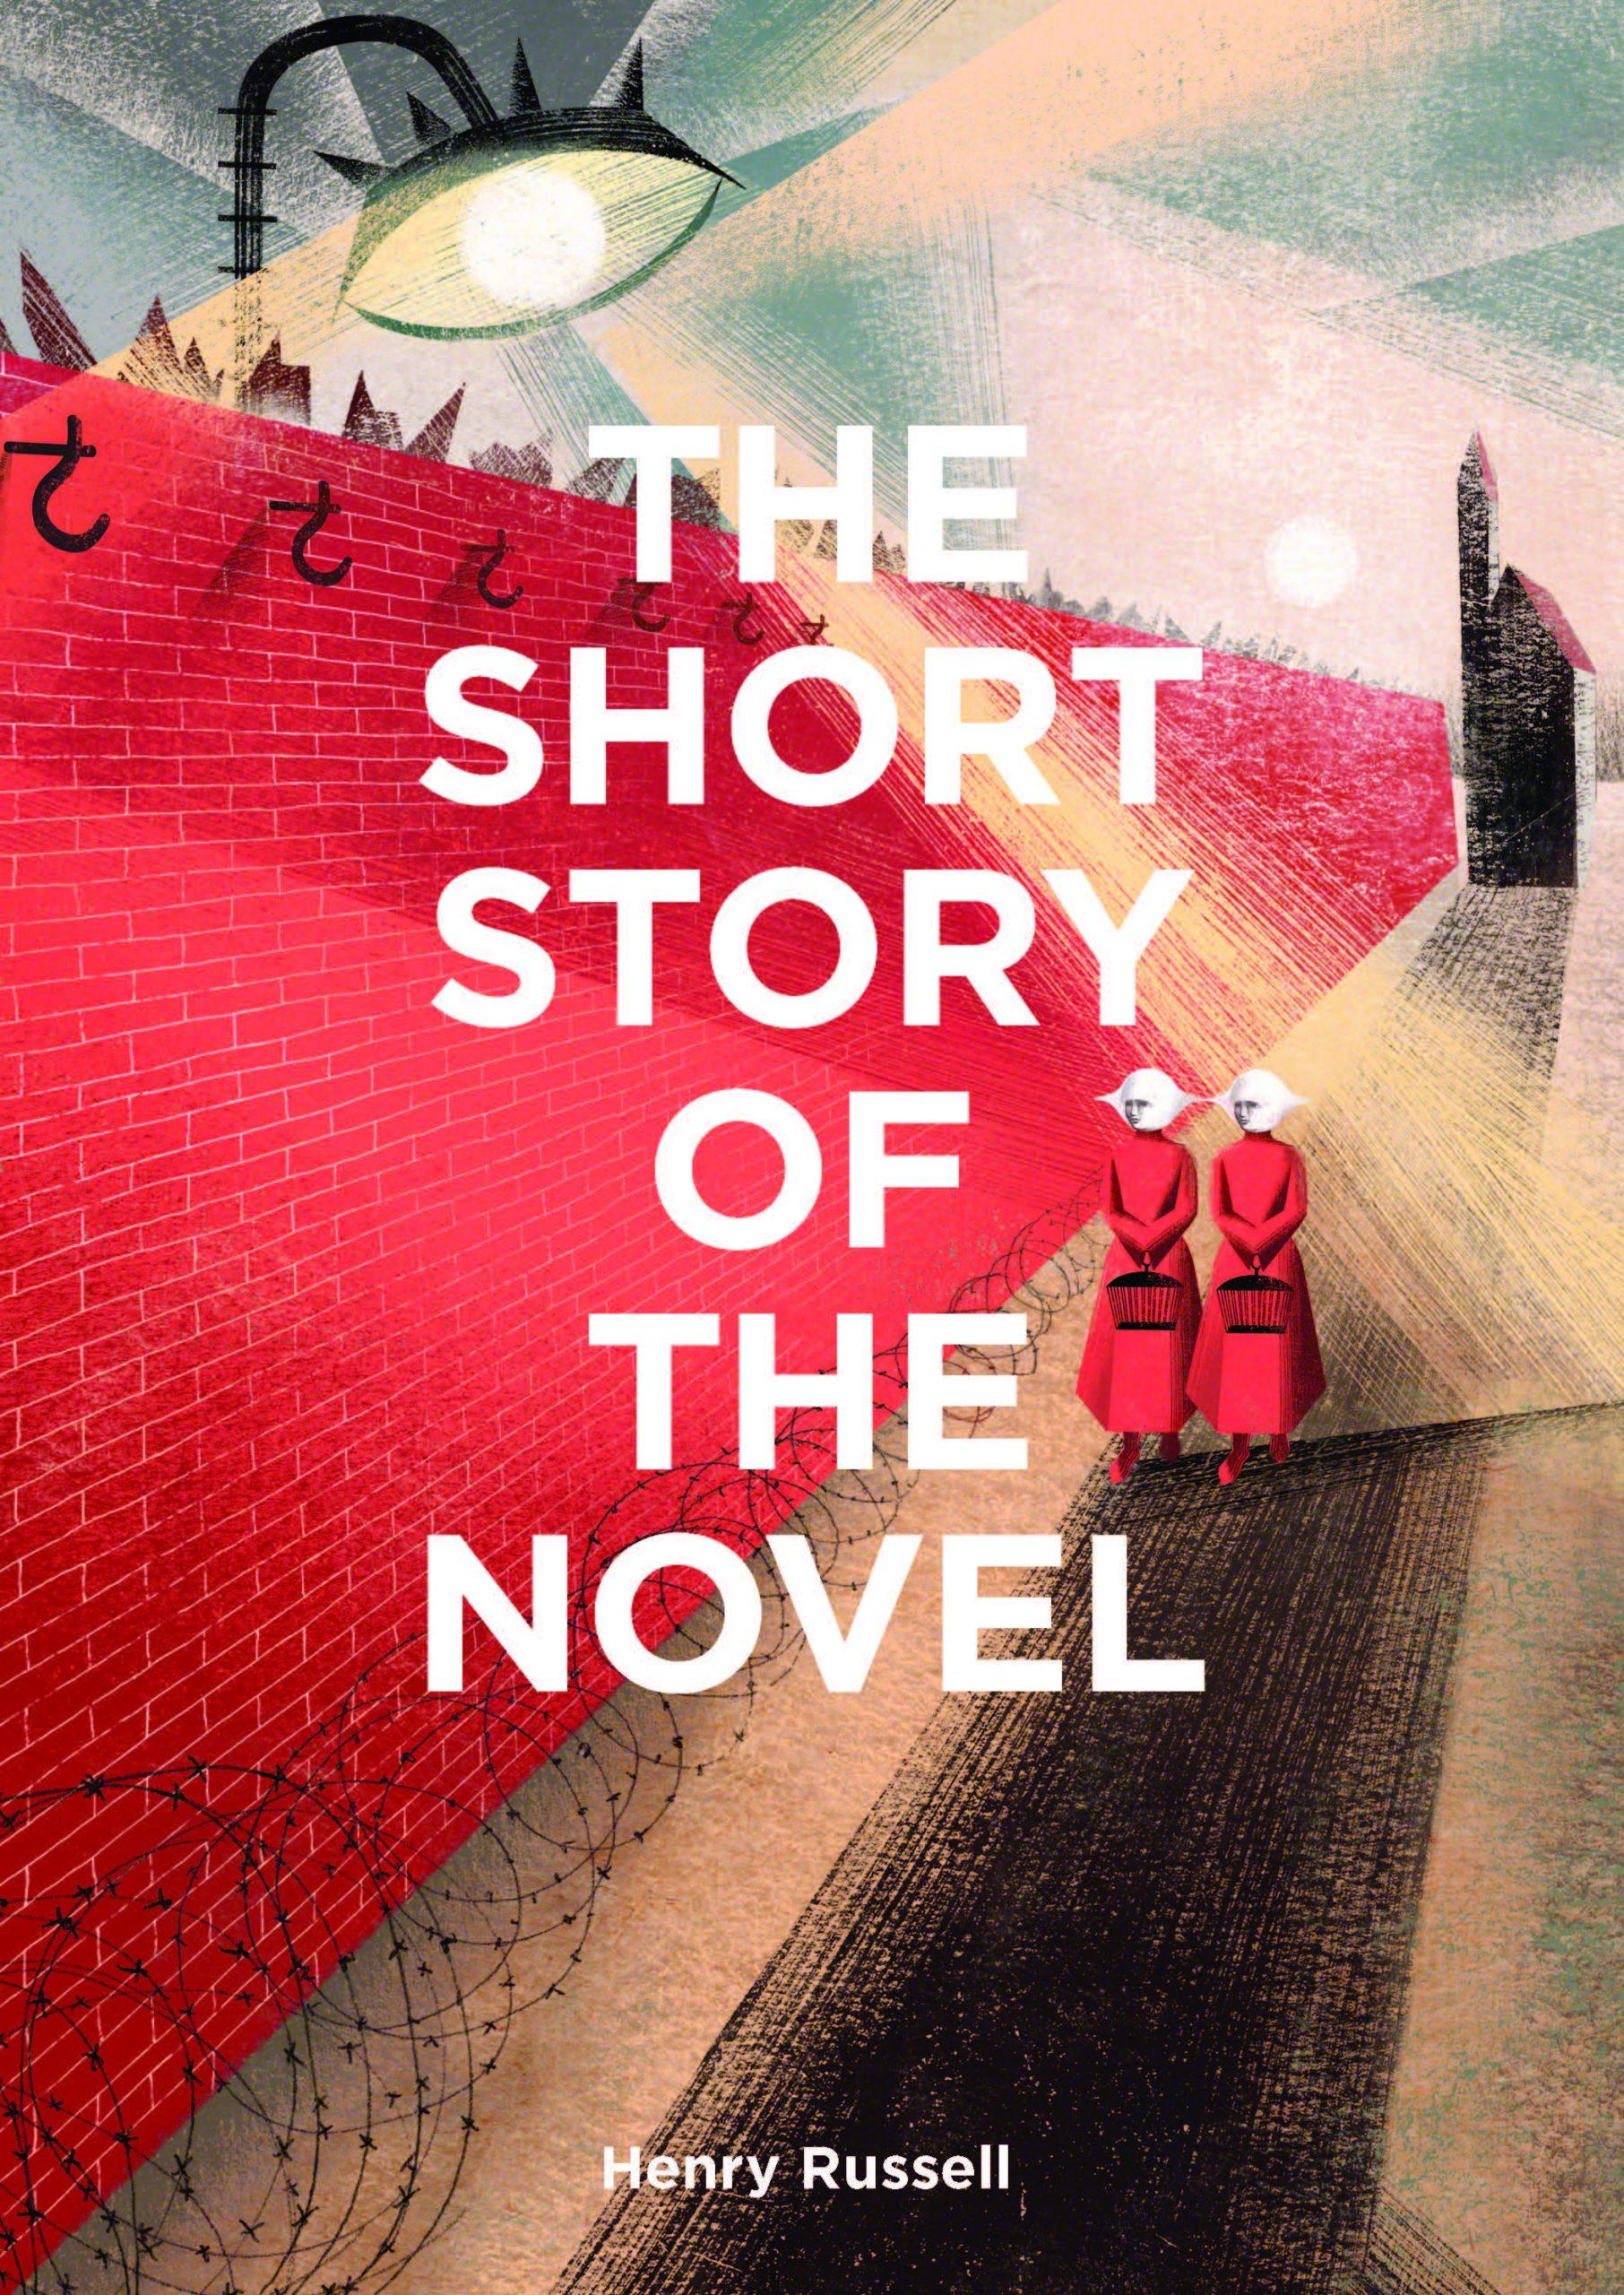 The Short Story of the Novel - Product Thumbnail